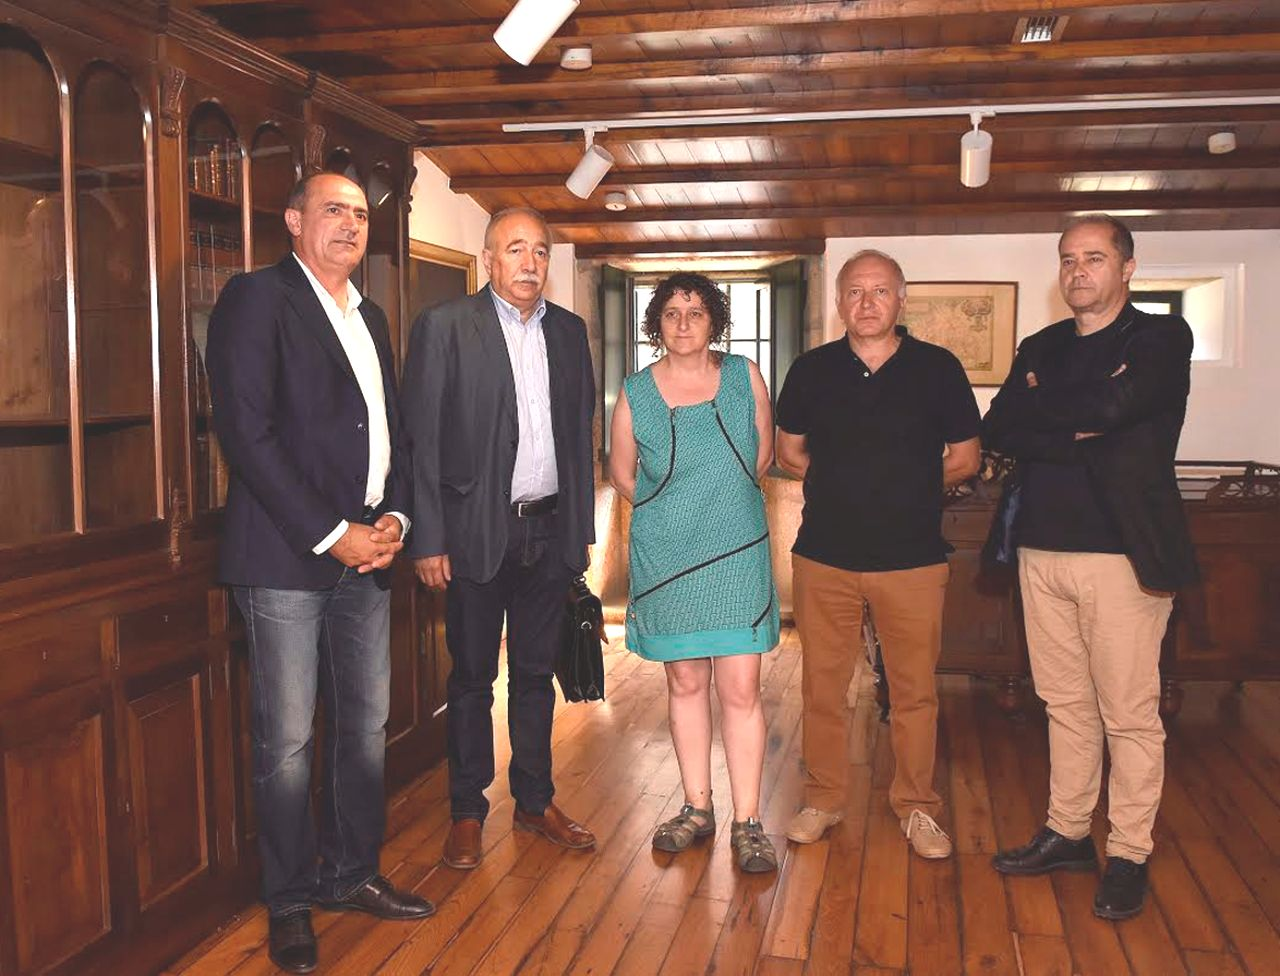 Pola esquerda, Angueira Viturro, Garc�a Garc�a, Sanmart�n, Beir� Pi�eiro e Barro, onte na visita � Casa Museo Rosal�a.  - FOTO: Sangiao